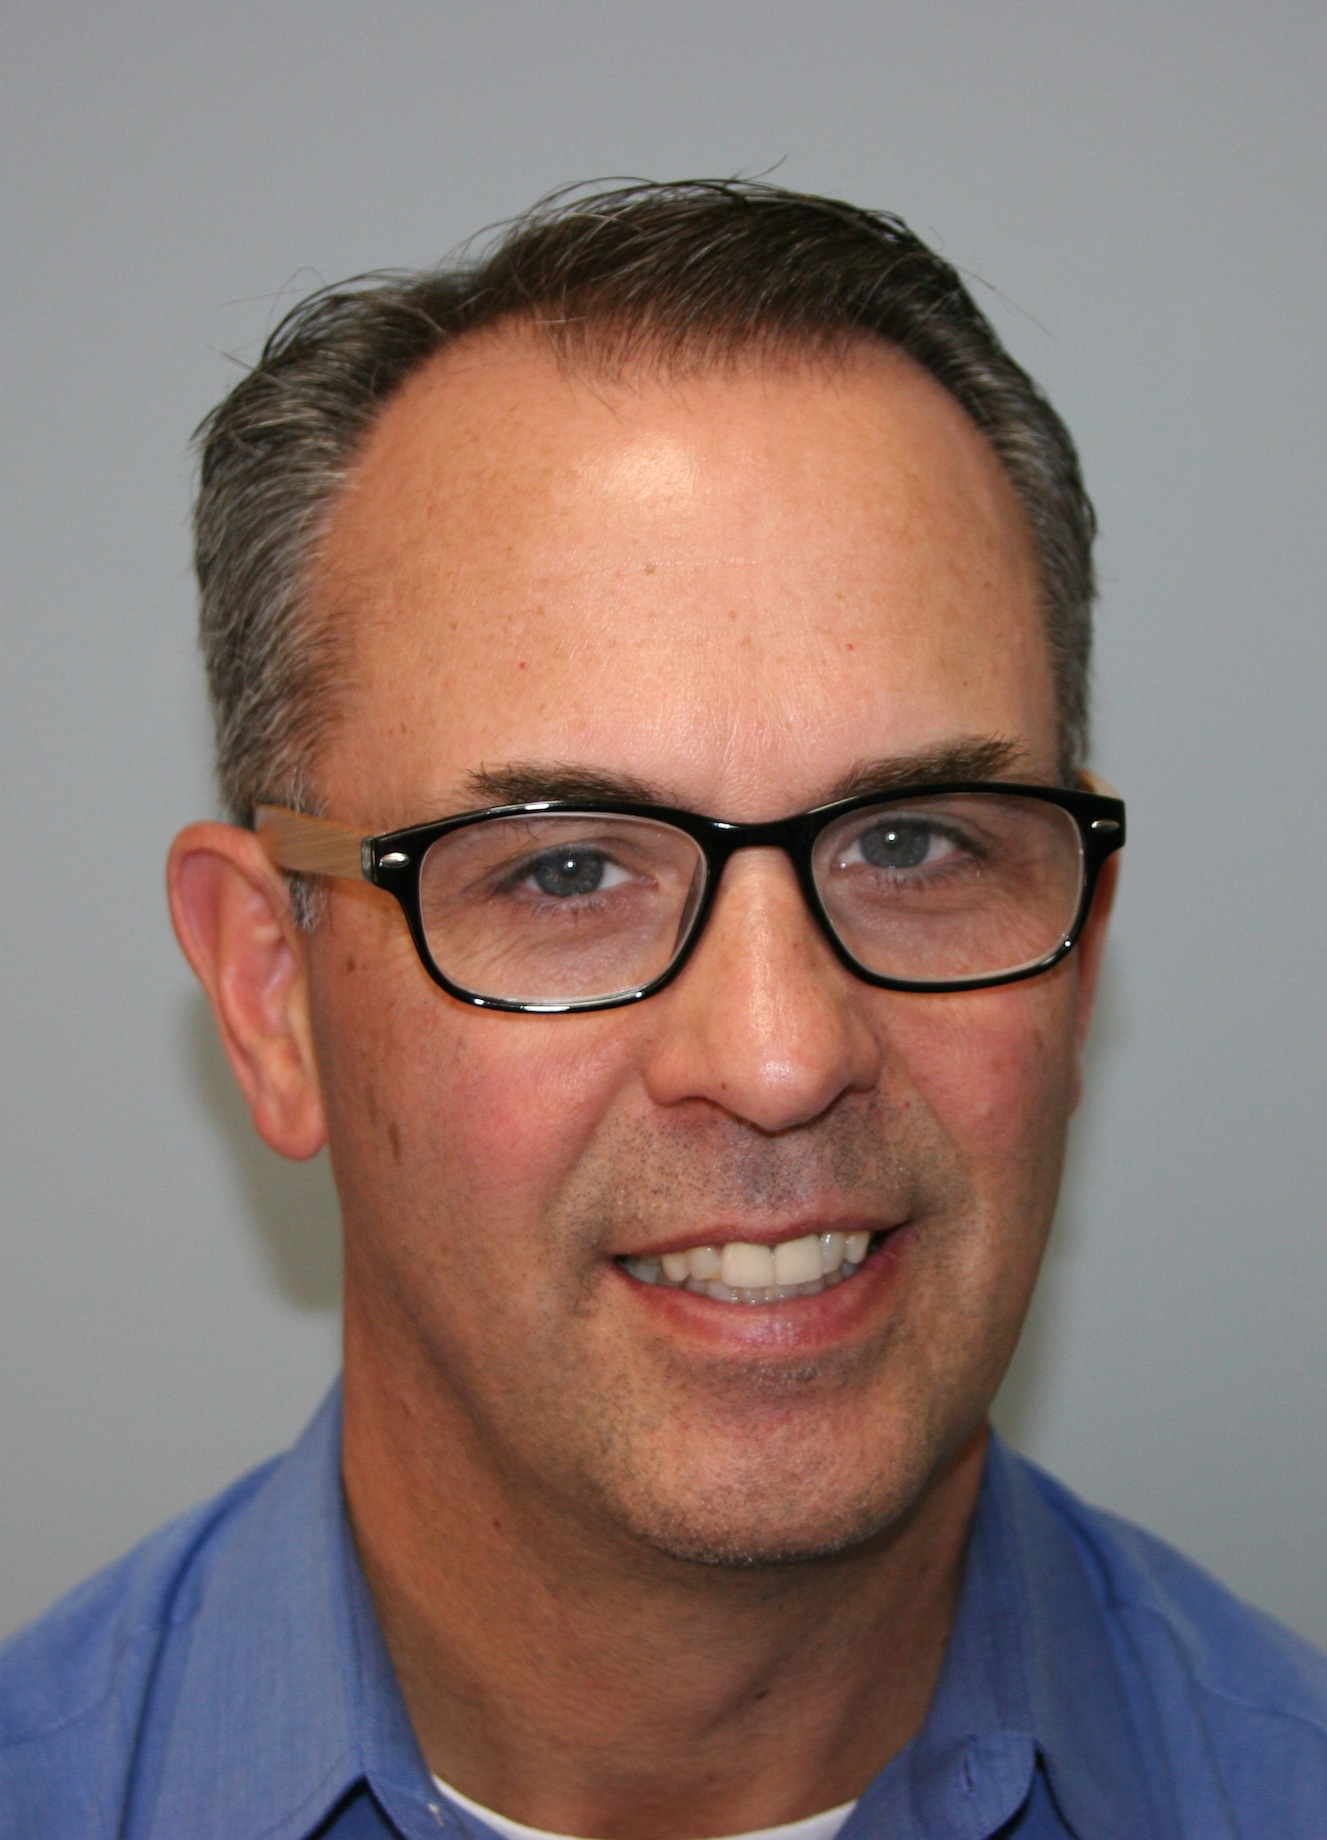 Head Orthodontics - Dr Douglas Head Nov 2018 t